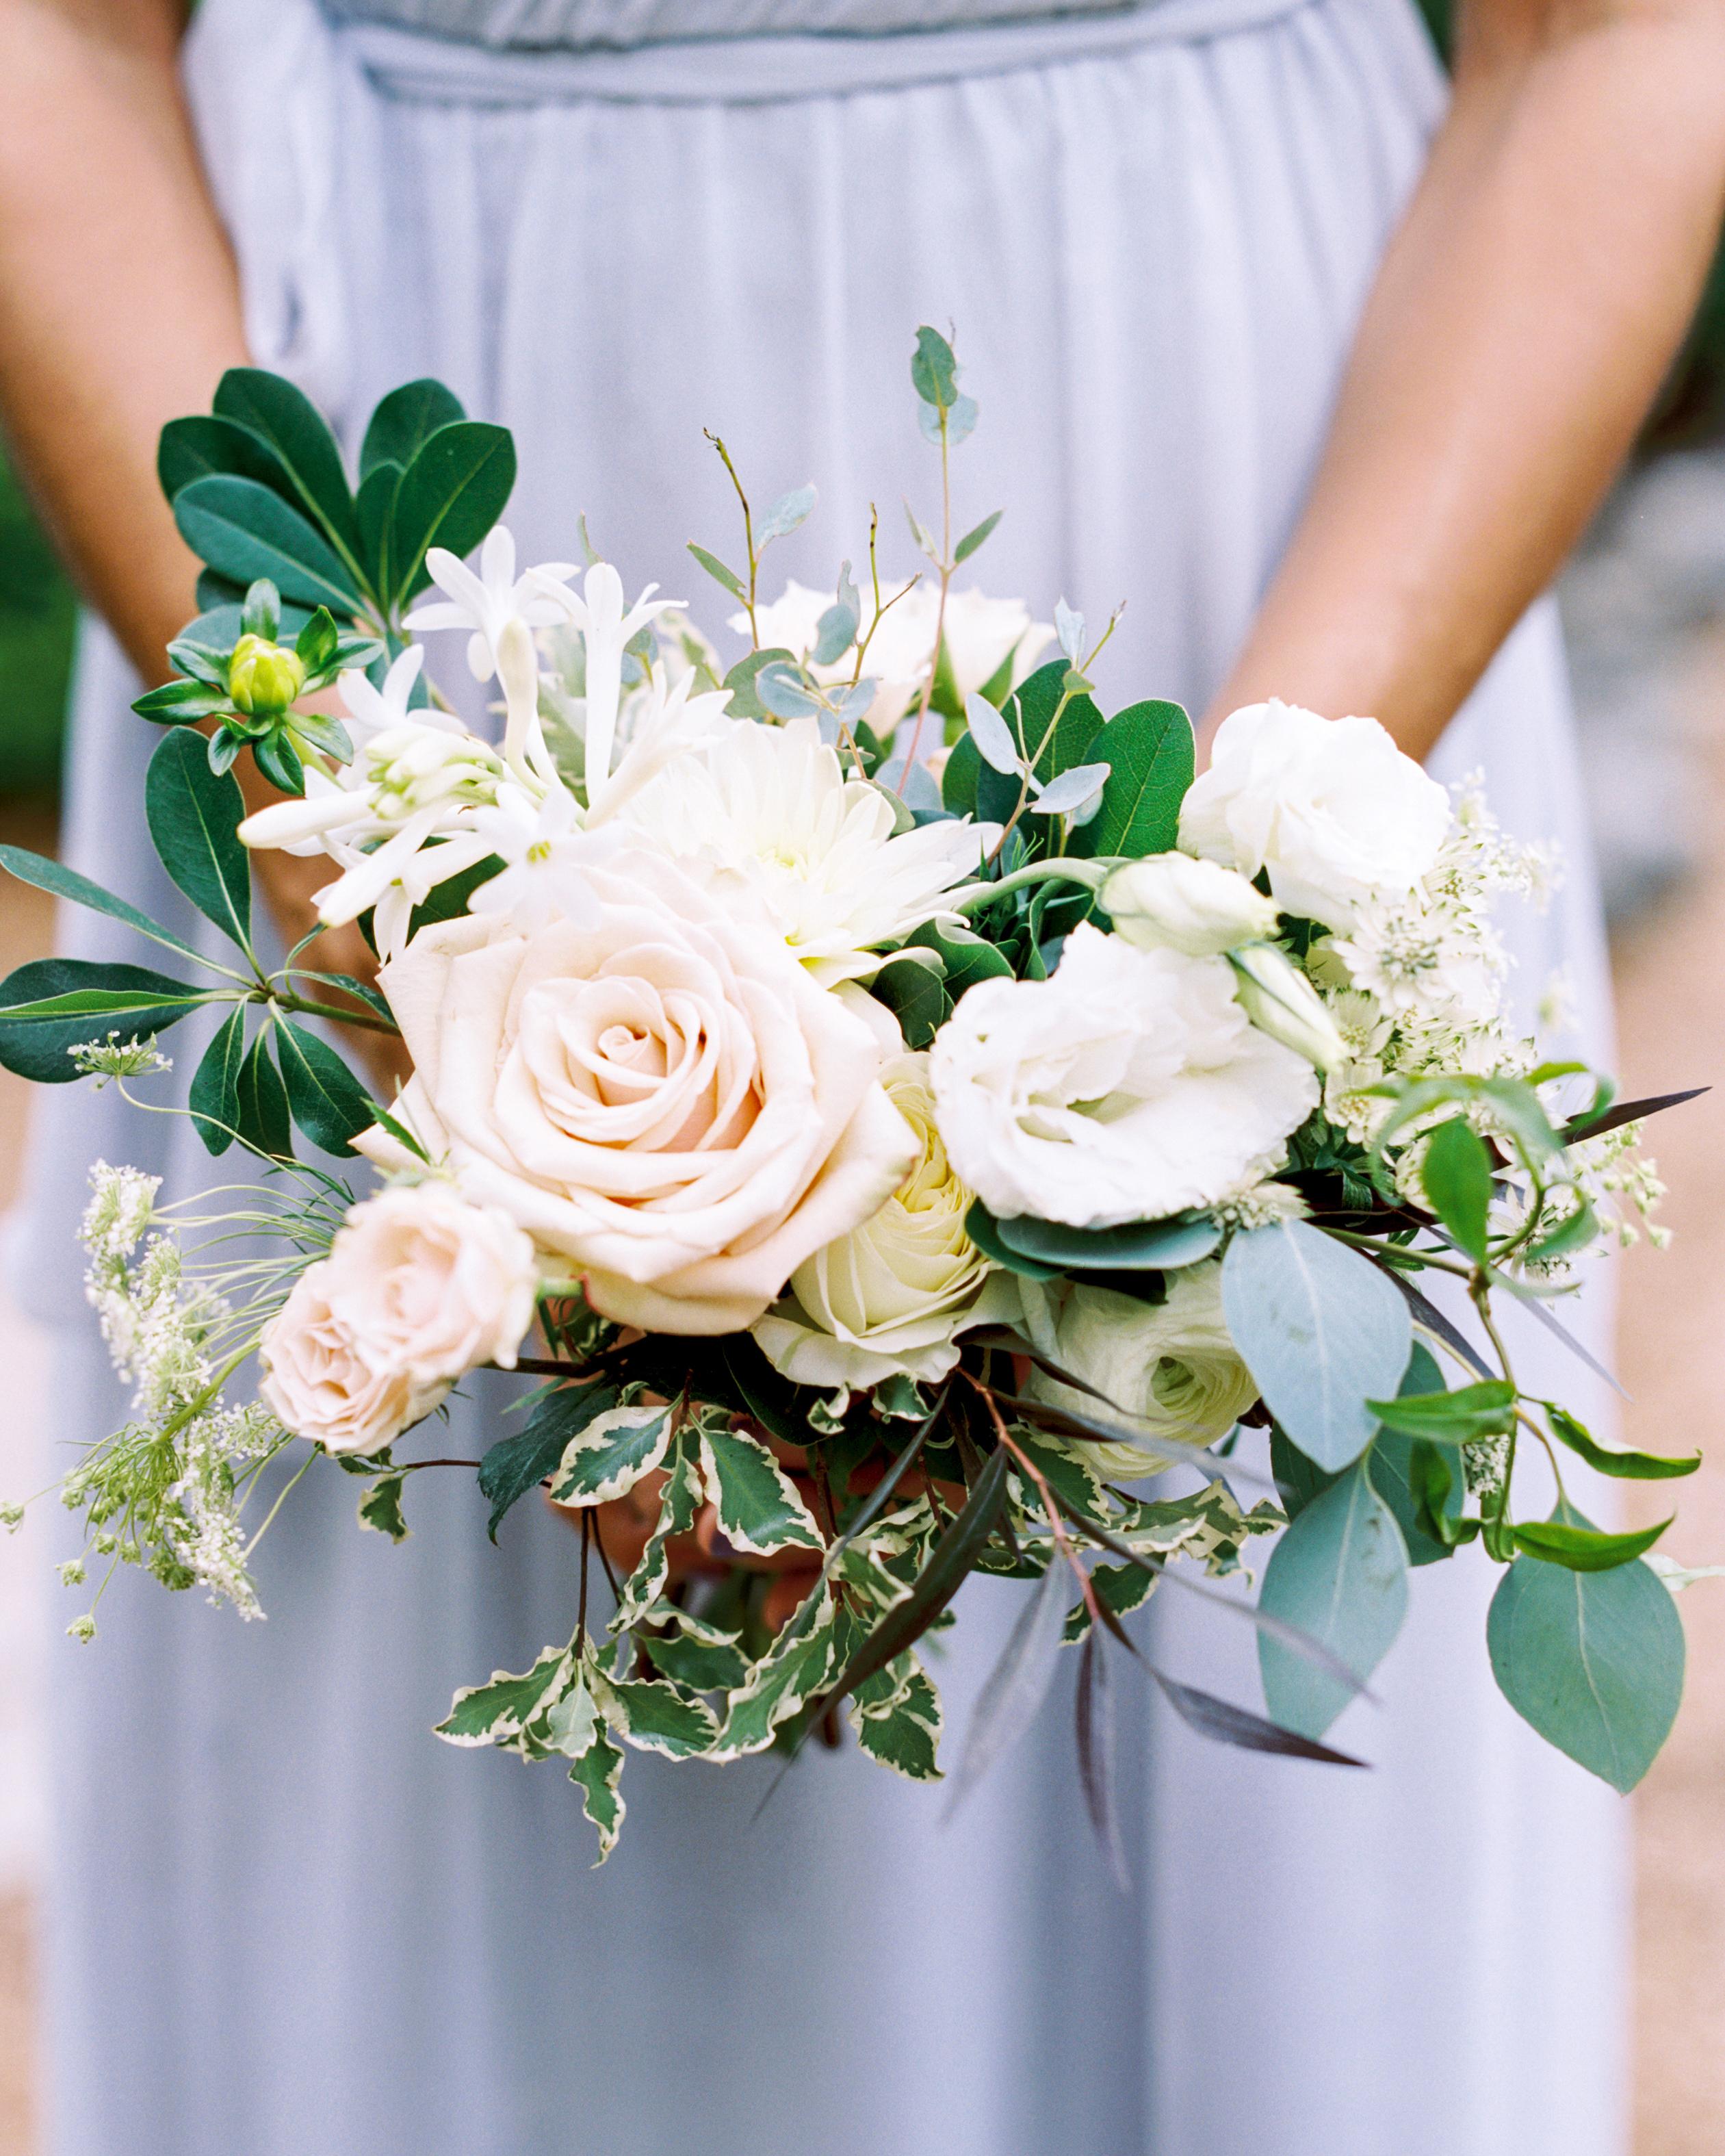 jackie-ross-wedding-bouquet-022-s111775-0215.jpg